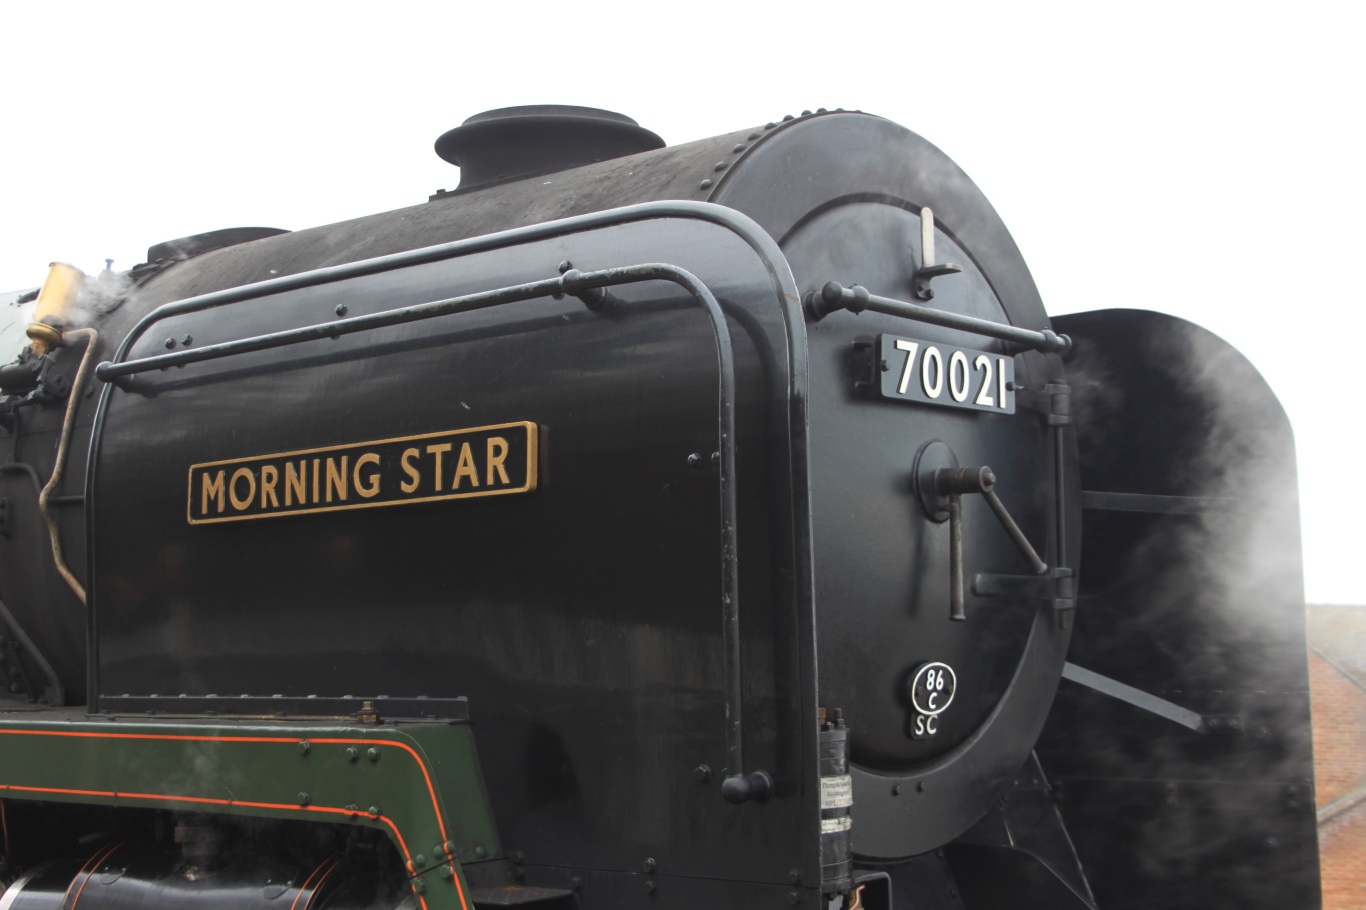 File:Morning Star 70021 (aka Britannia 70000) JPG